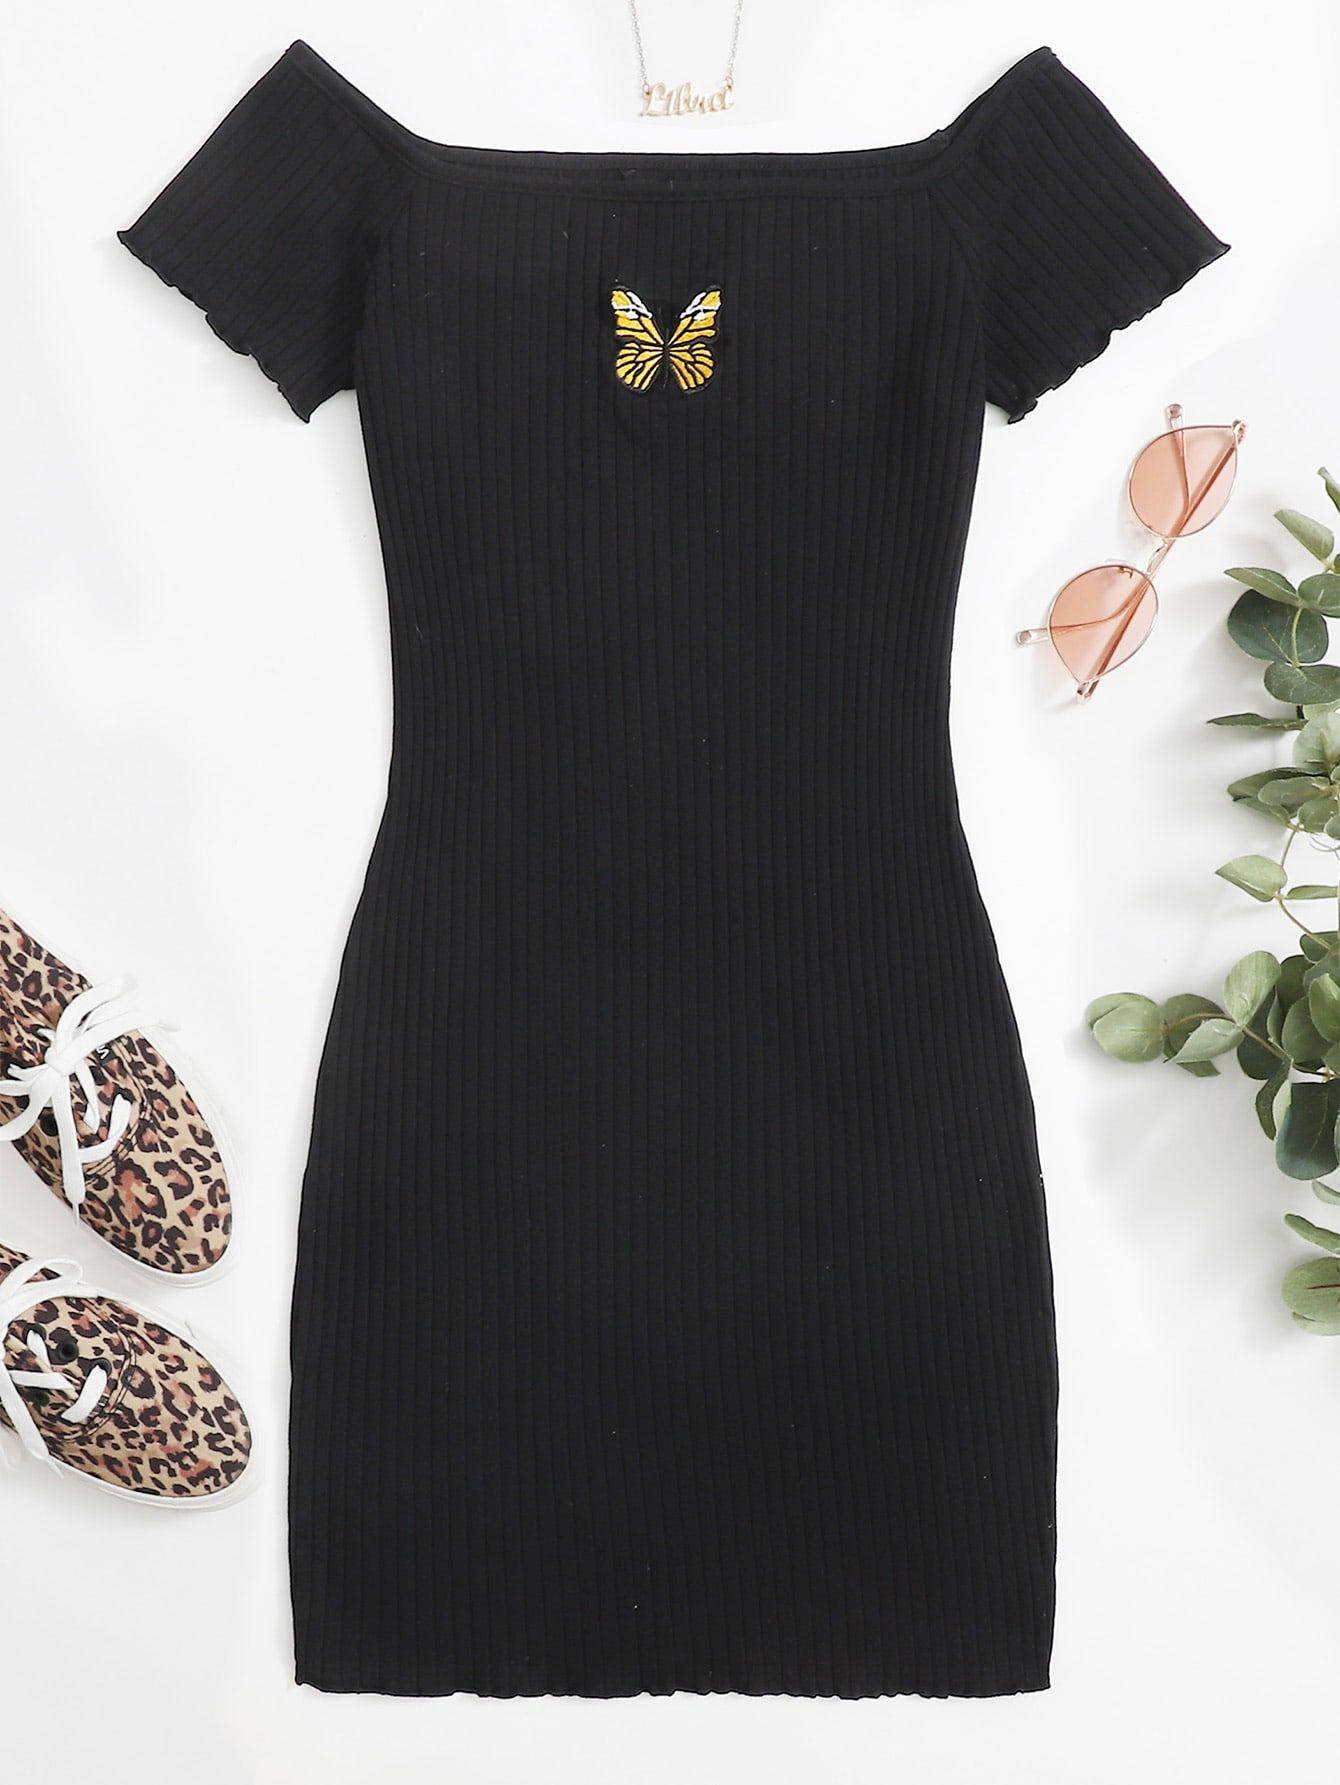 Lettuce Trim Embroidery Butterfly Rib Knit Dress Shein Usa Ribbed Knit Dress Fashion Tops Blouse Dresses [ 1785 x 1340 Pixel ]